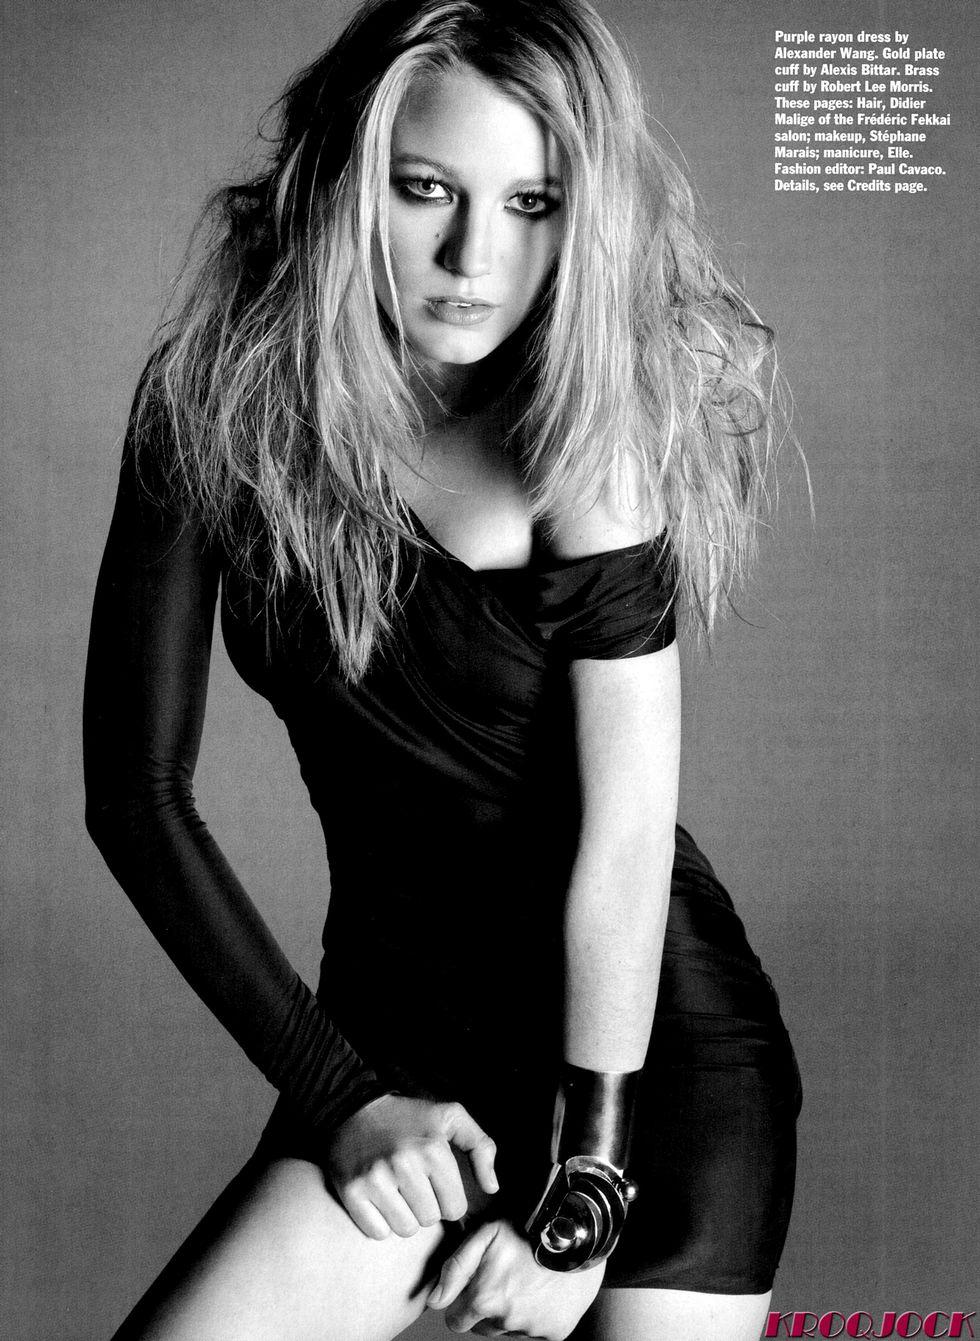 blake-lively-allure-magazine-may-2009-01